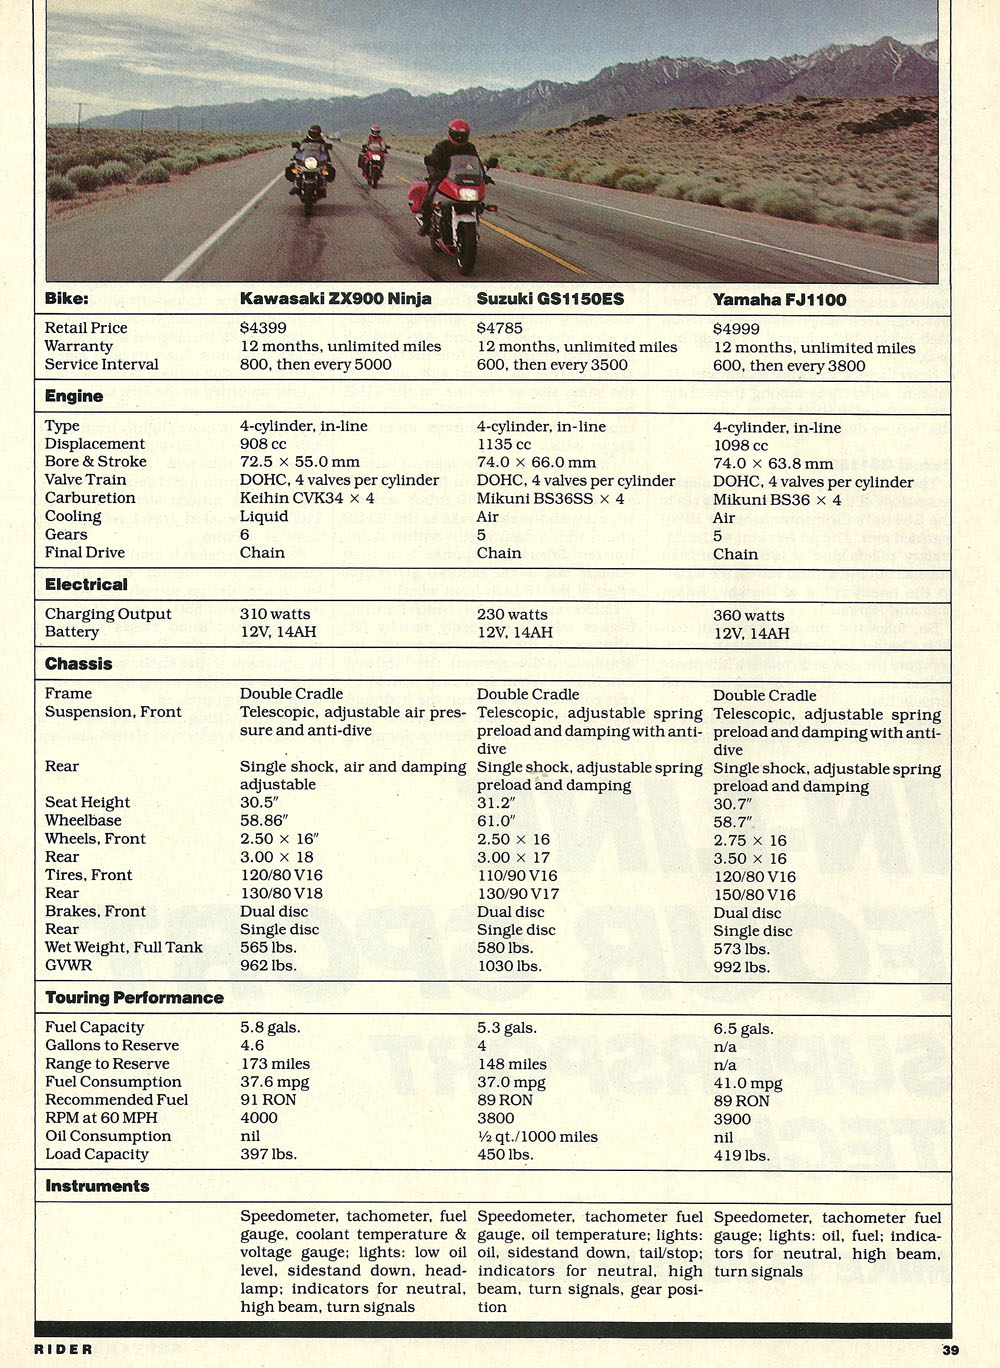 1984 fj1100 zx900 gs1150 road test 06.jpg